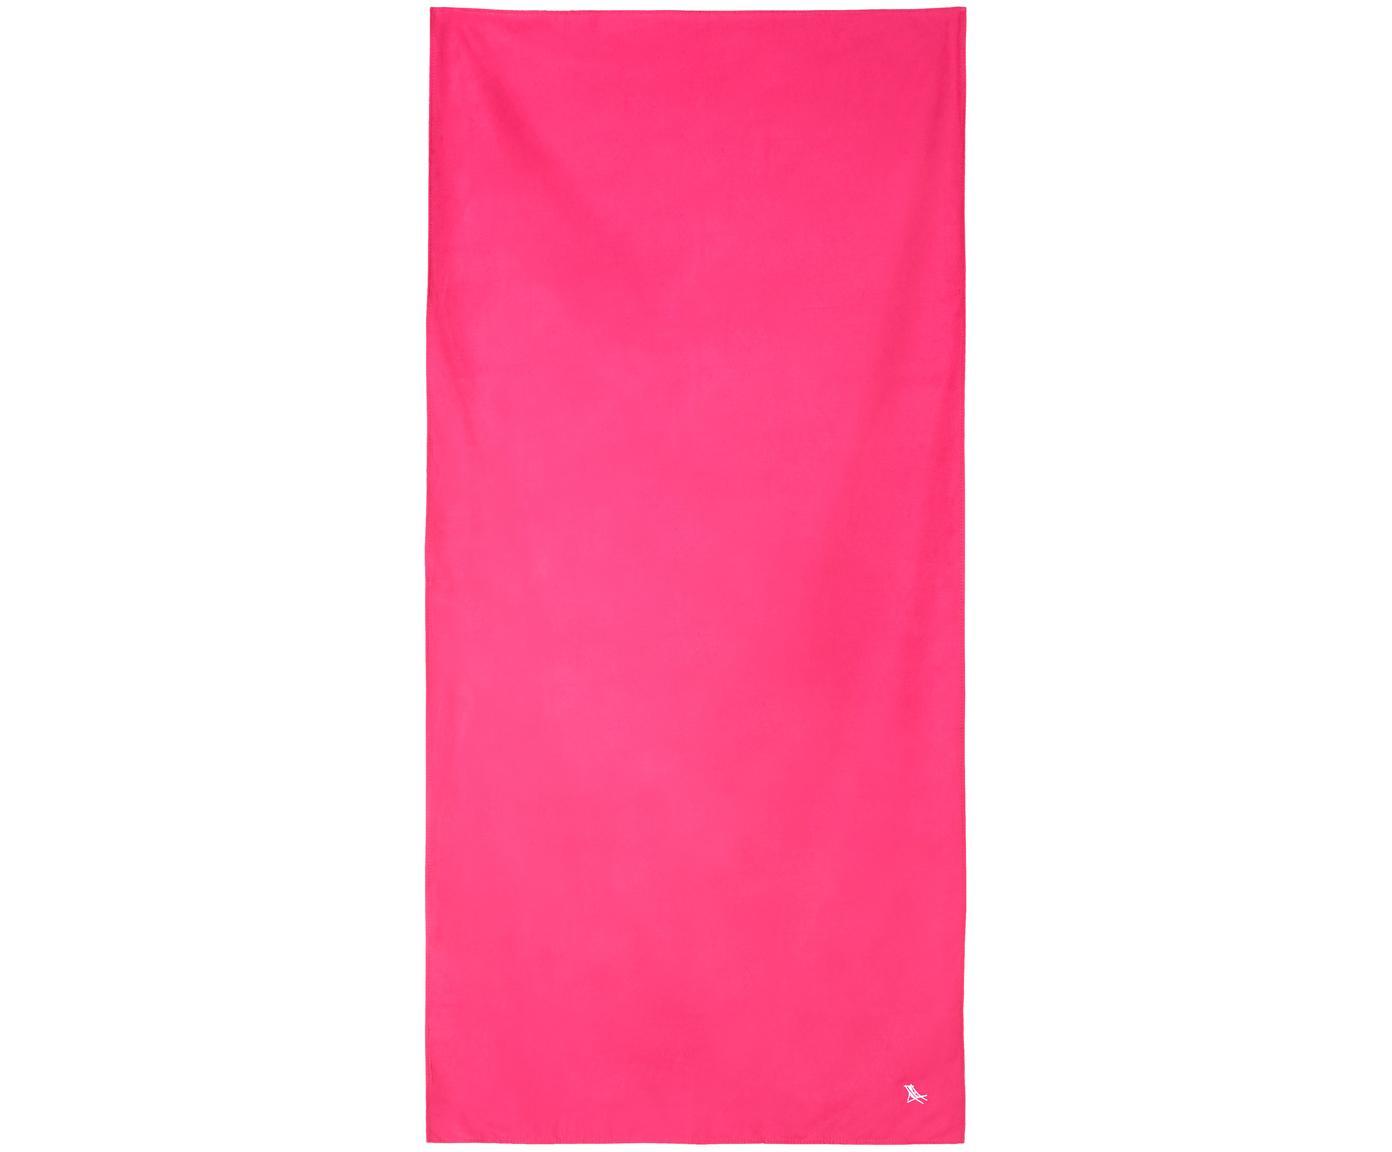 Microvezel strandlaken Classic, sneldrogend, Microvezels (80% polyester, 20% polyamide), Roze, 90 x 200 cm